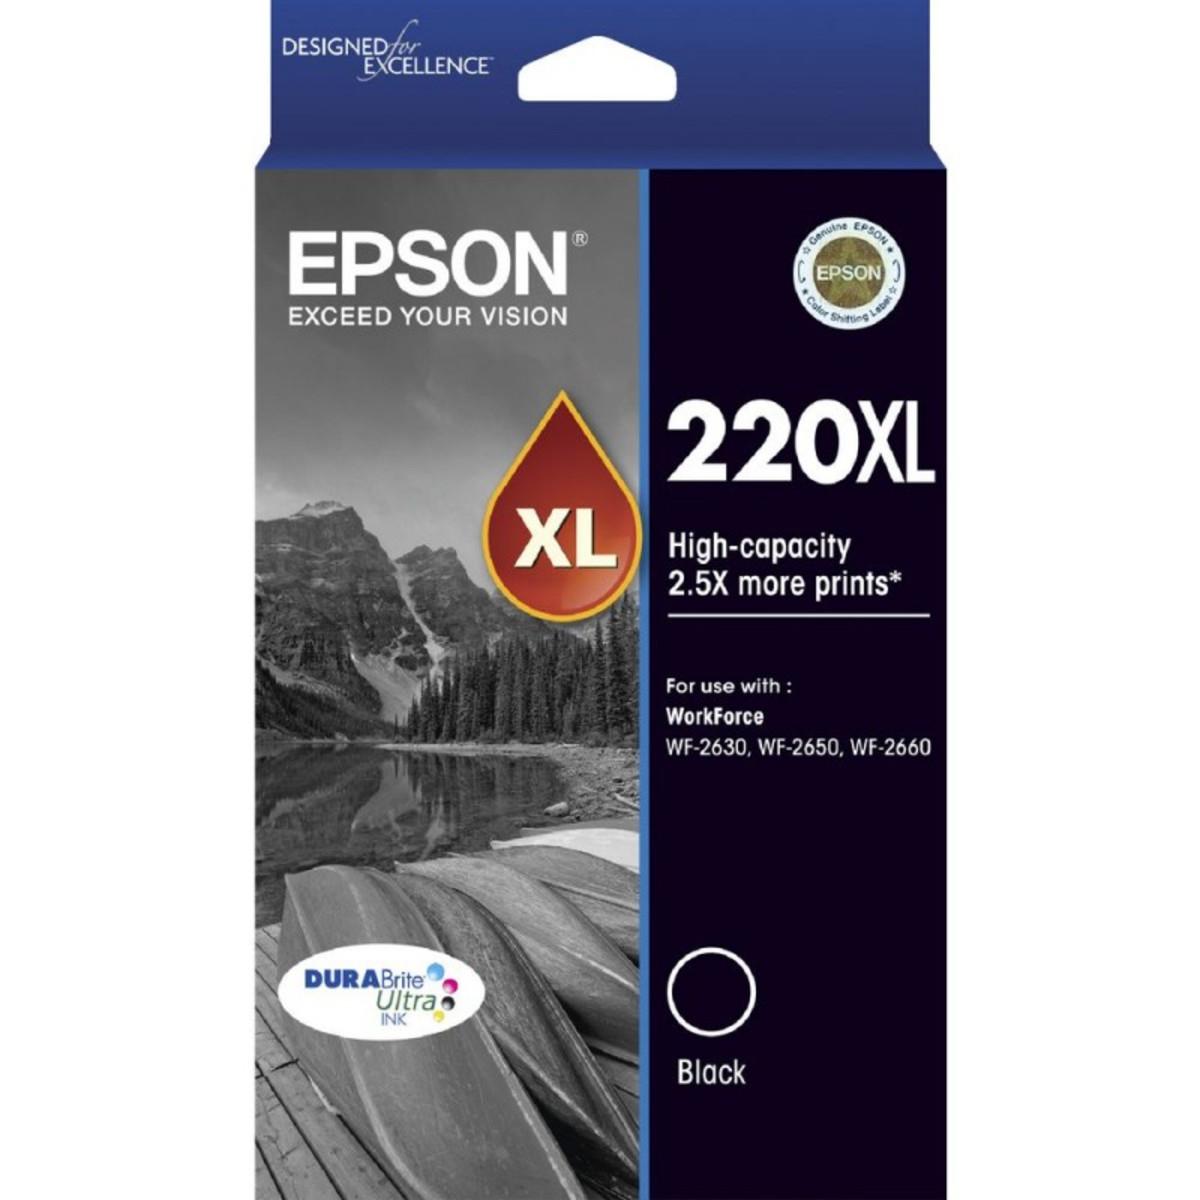 Epson 220XL Black Ink Cartridge - High Yield